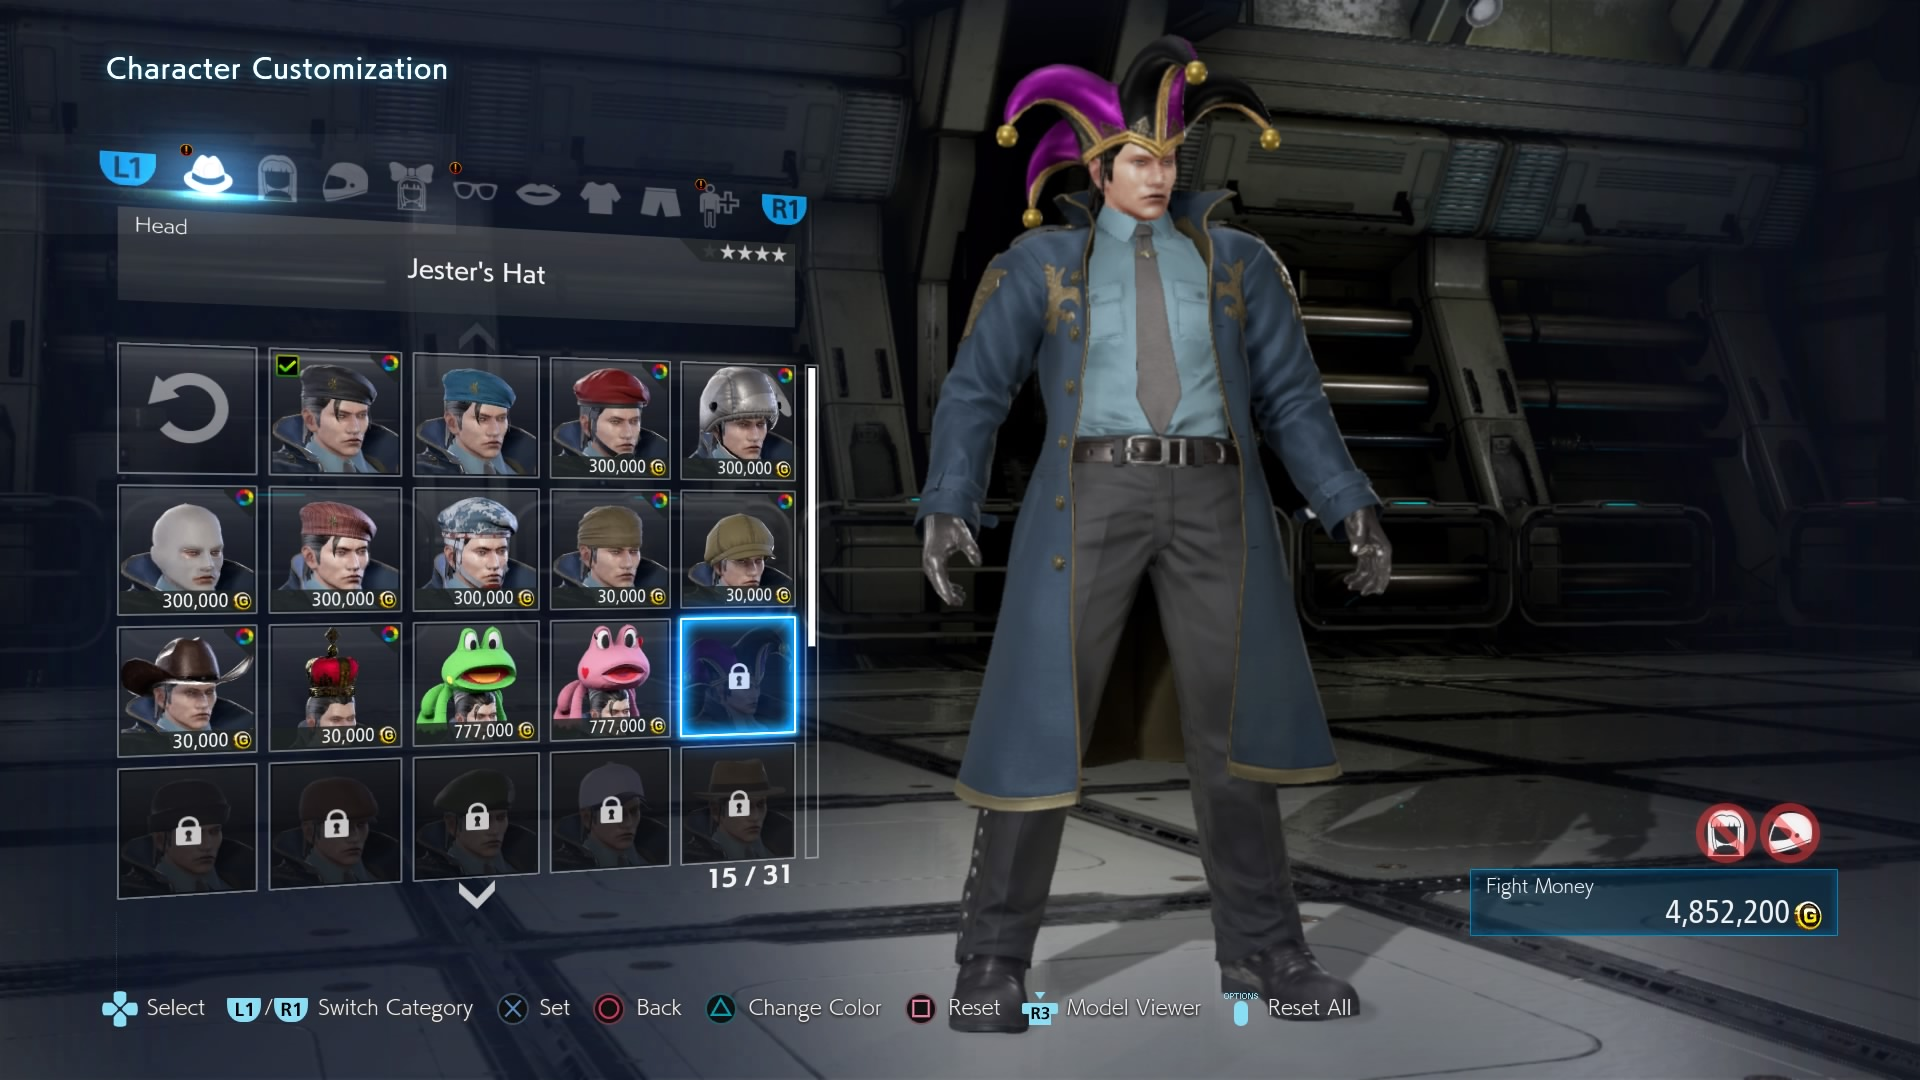 Tekken 7 Character Customization Gallery All Alternate Costumes Walkthroughs The Escapist